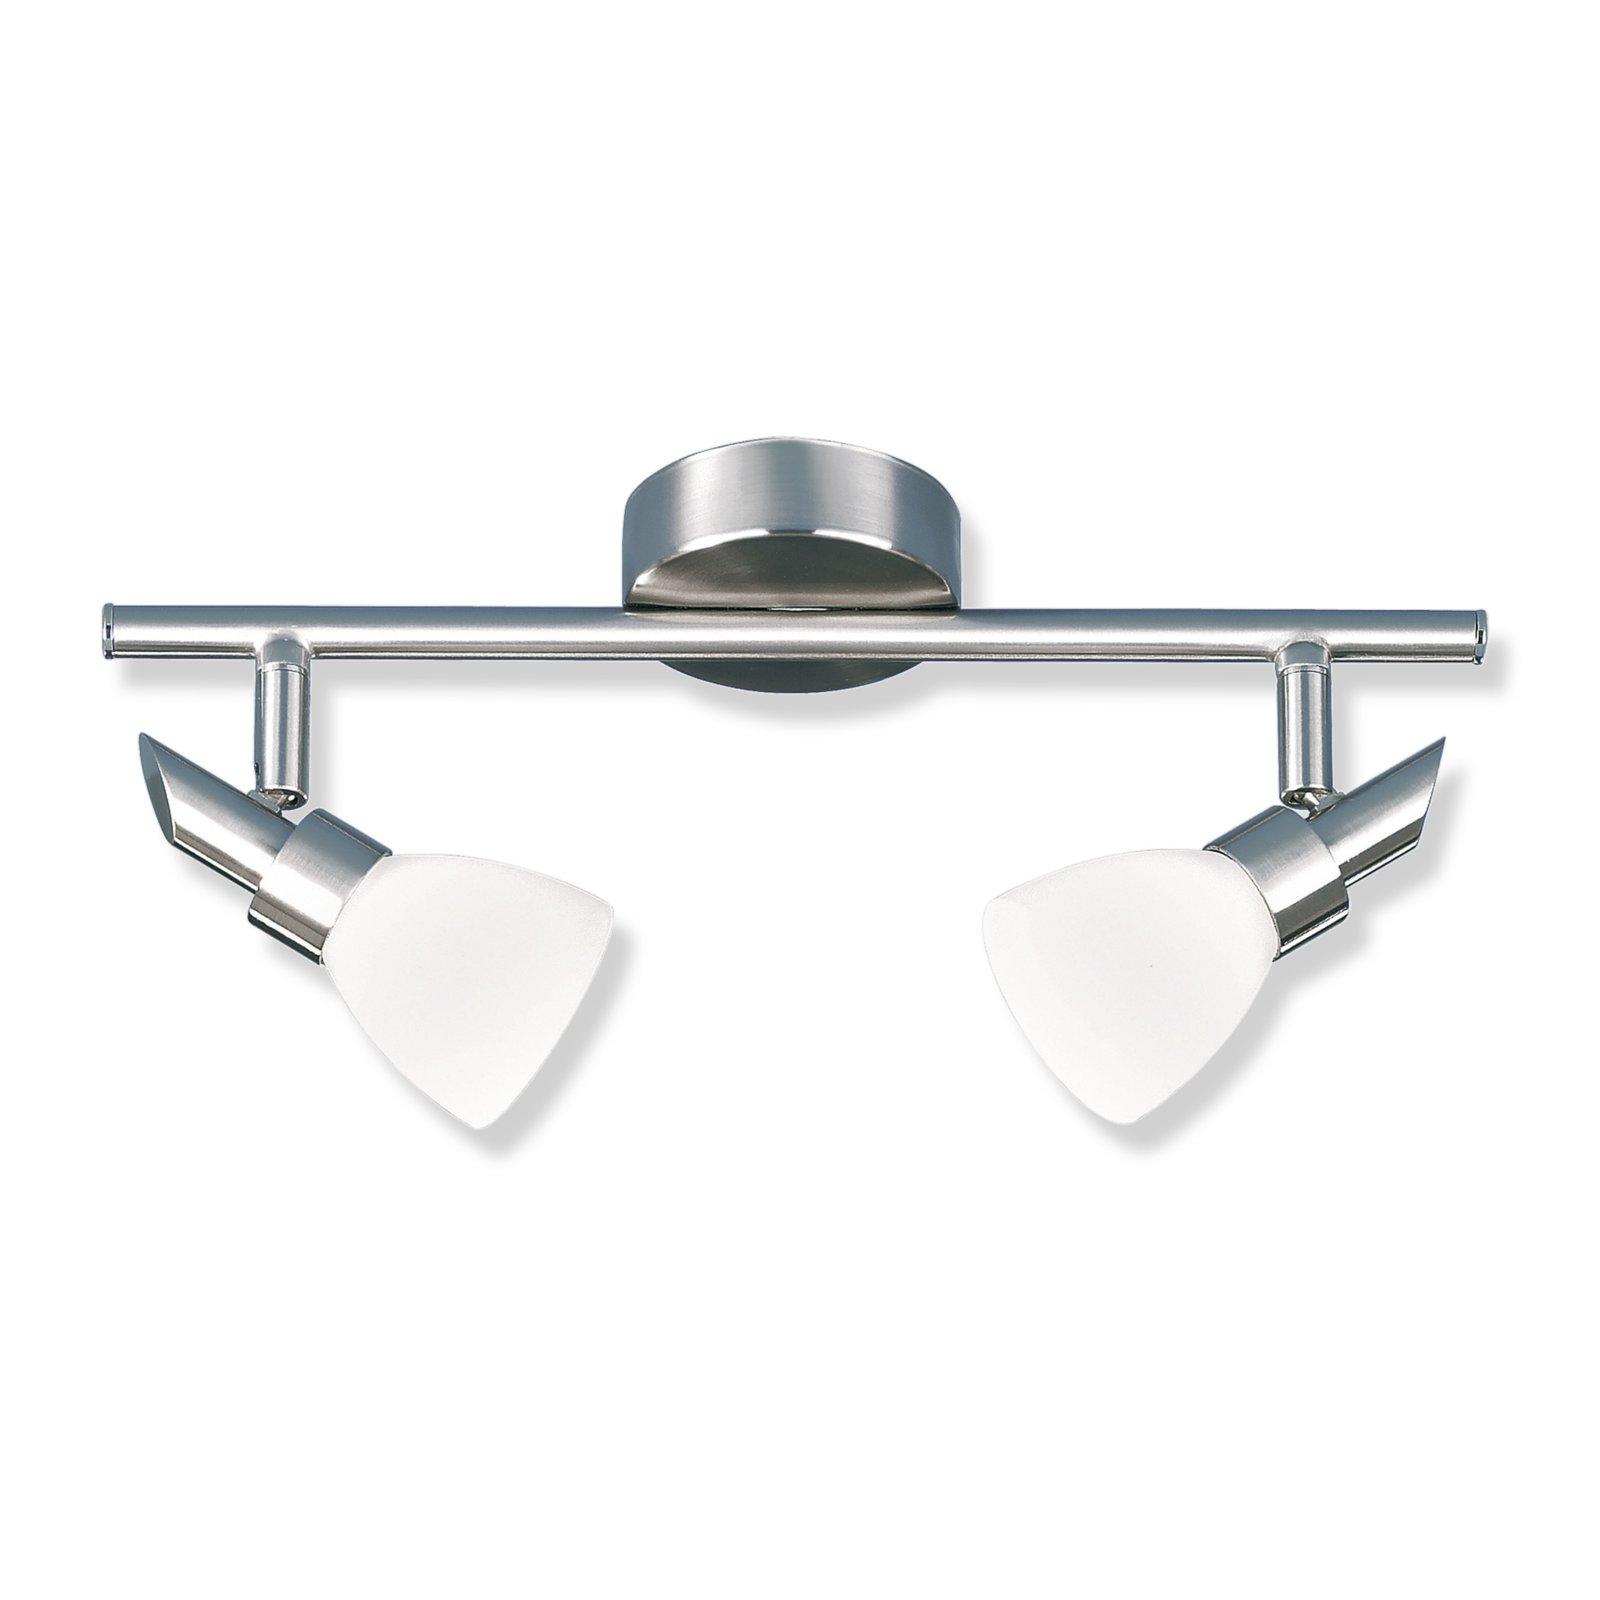 Deckenstrahler pep 2 metall nickel glas wei for Lampen roller